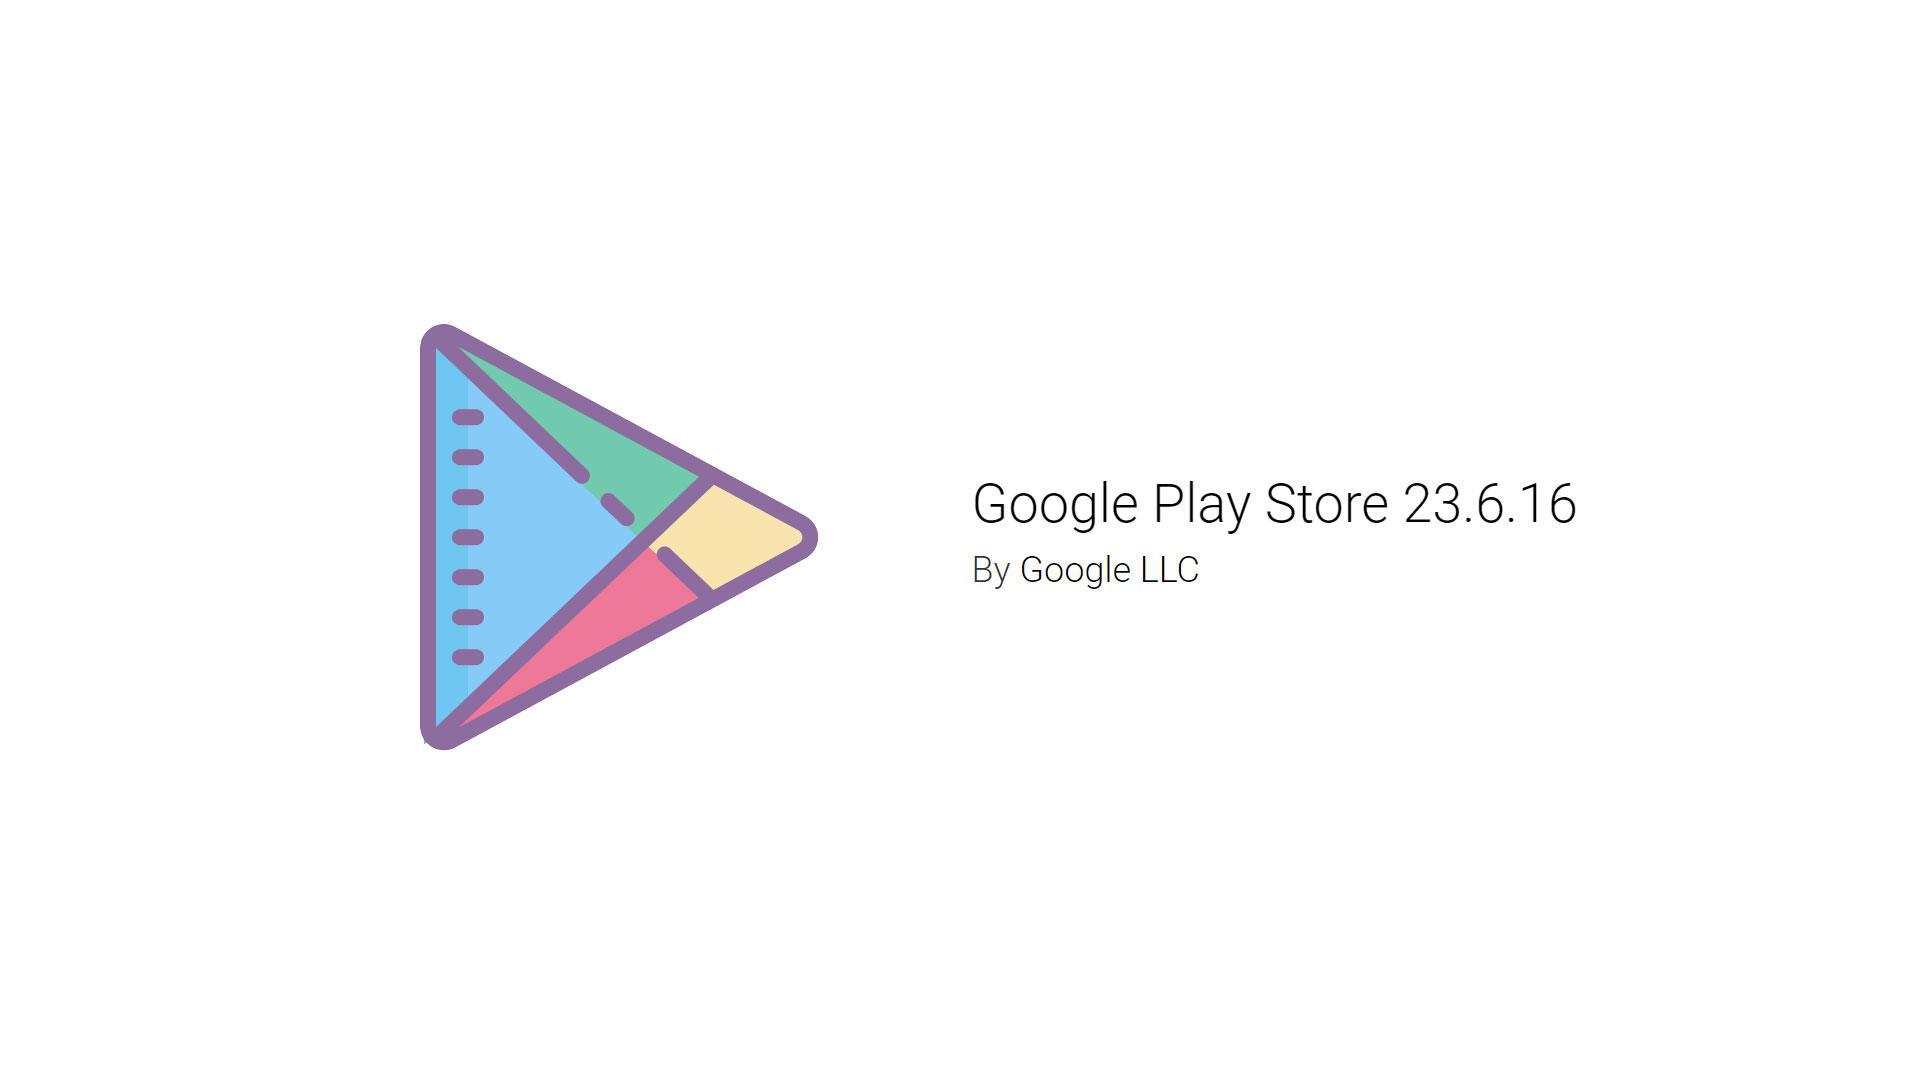 Google Play Store обновился до версии 23.6.16. Скачиваем